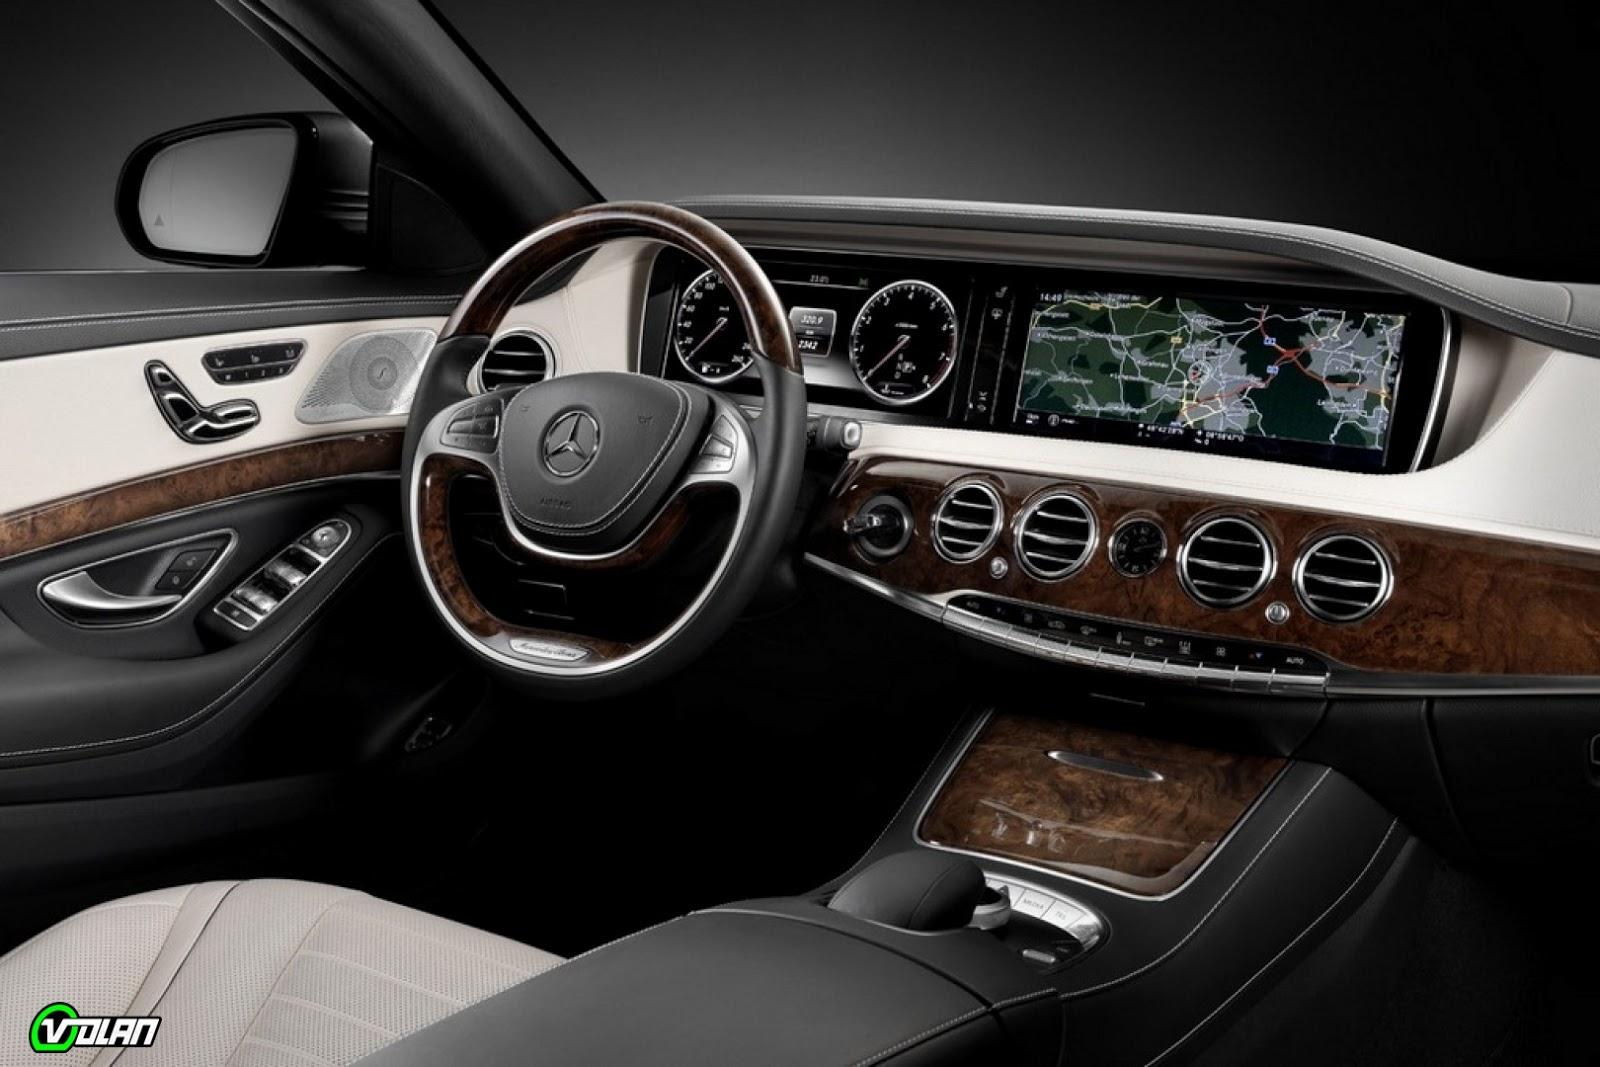 Hd Wallpapers High Definition Wallpapertopfree Mercedes S